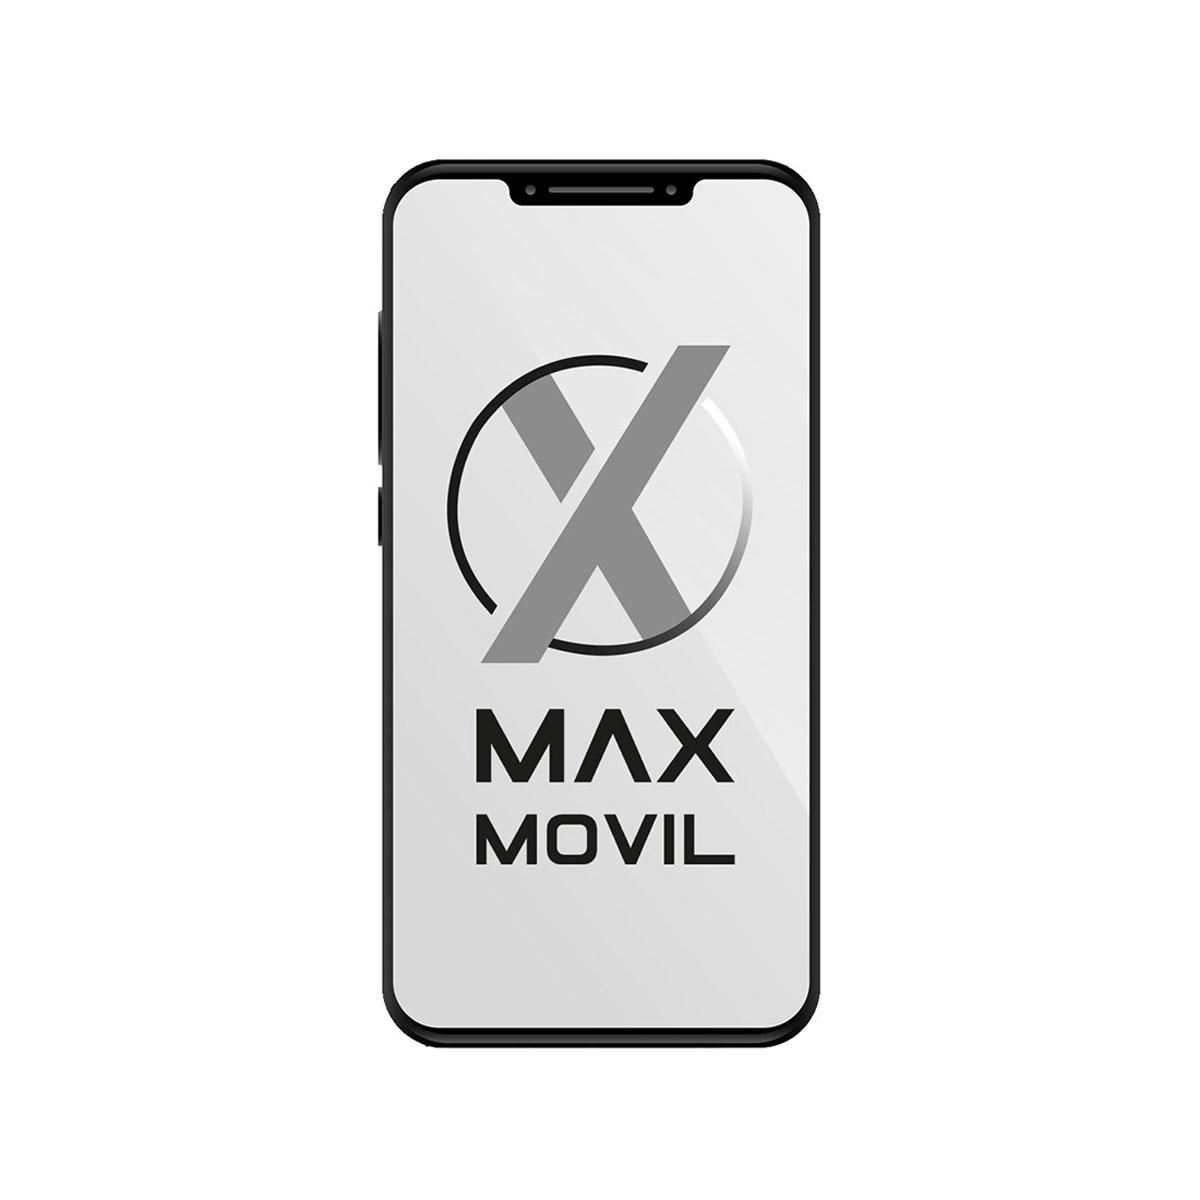 Apple iPhone 8 Plus Reacondicionado 64GB Gris (Space Grey)